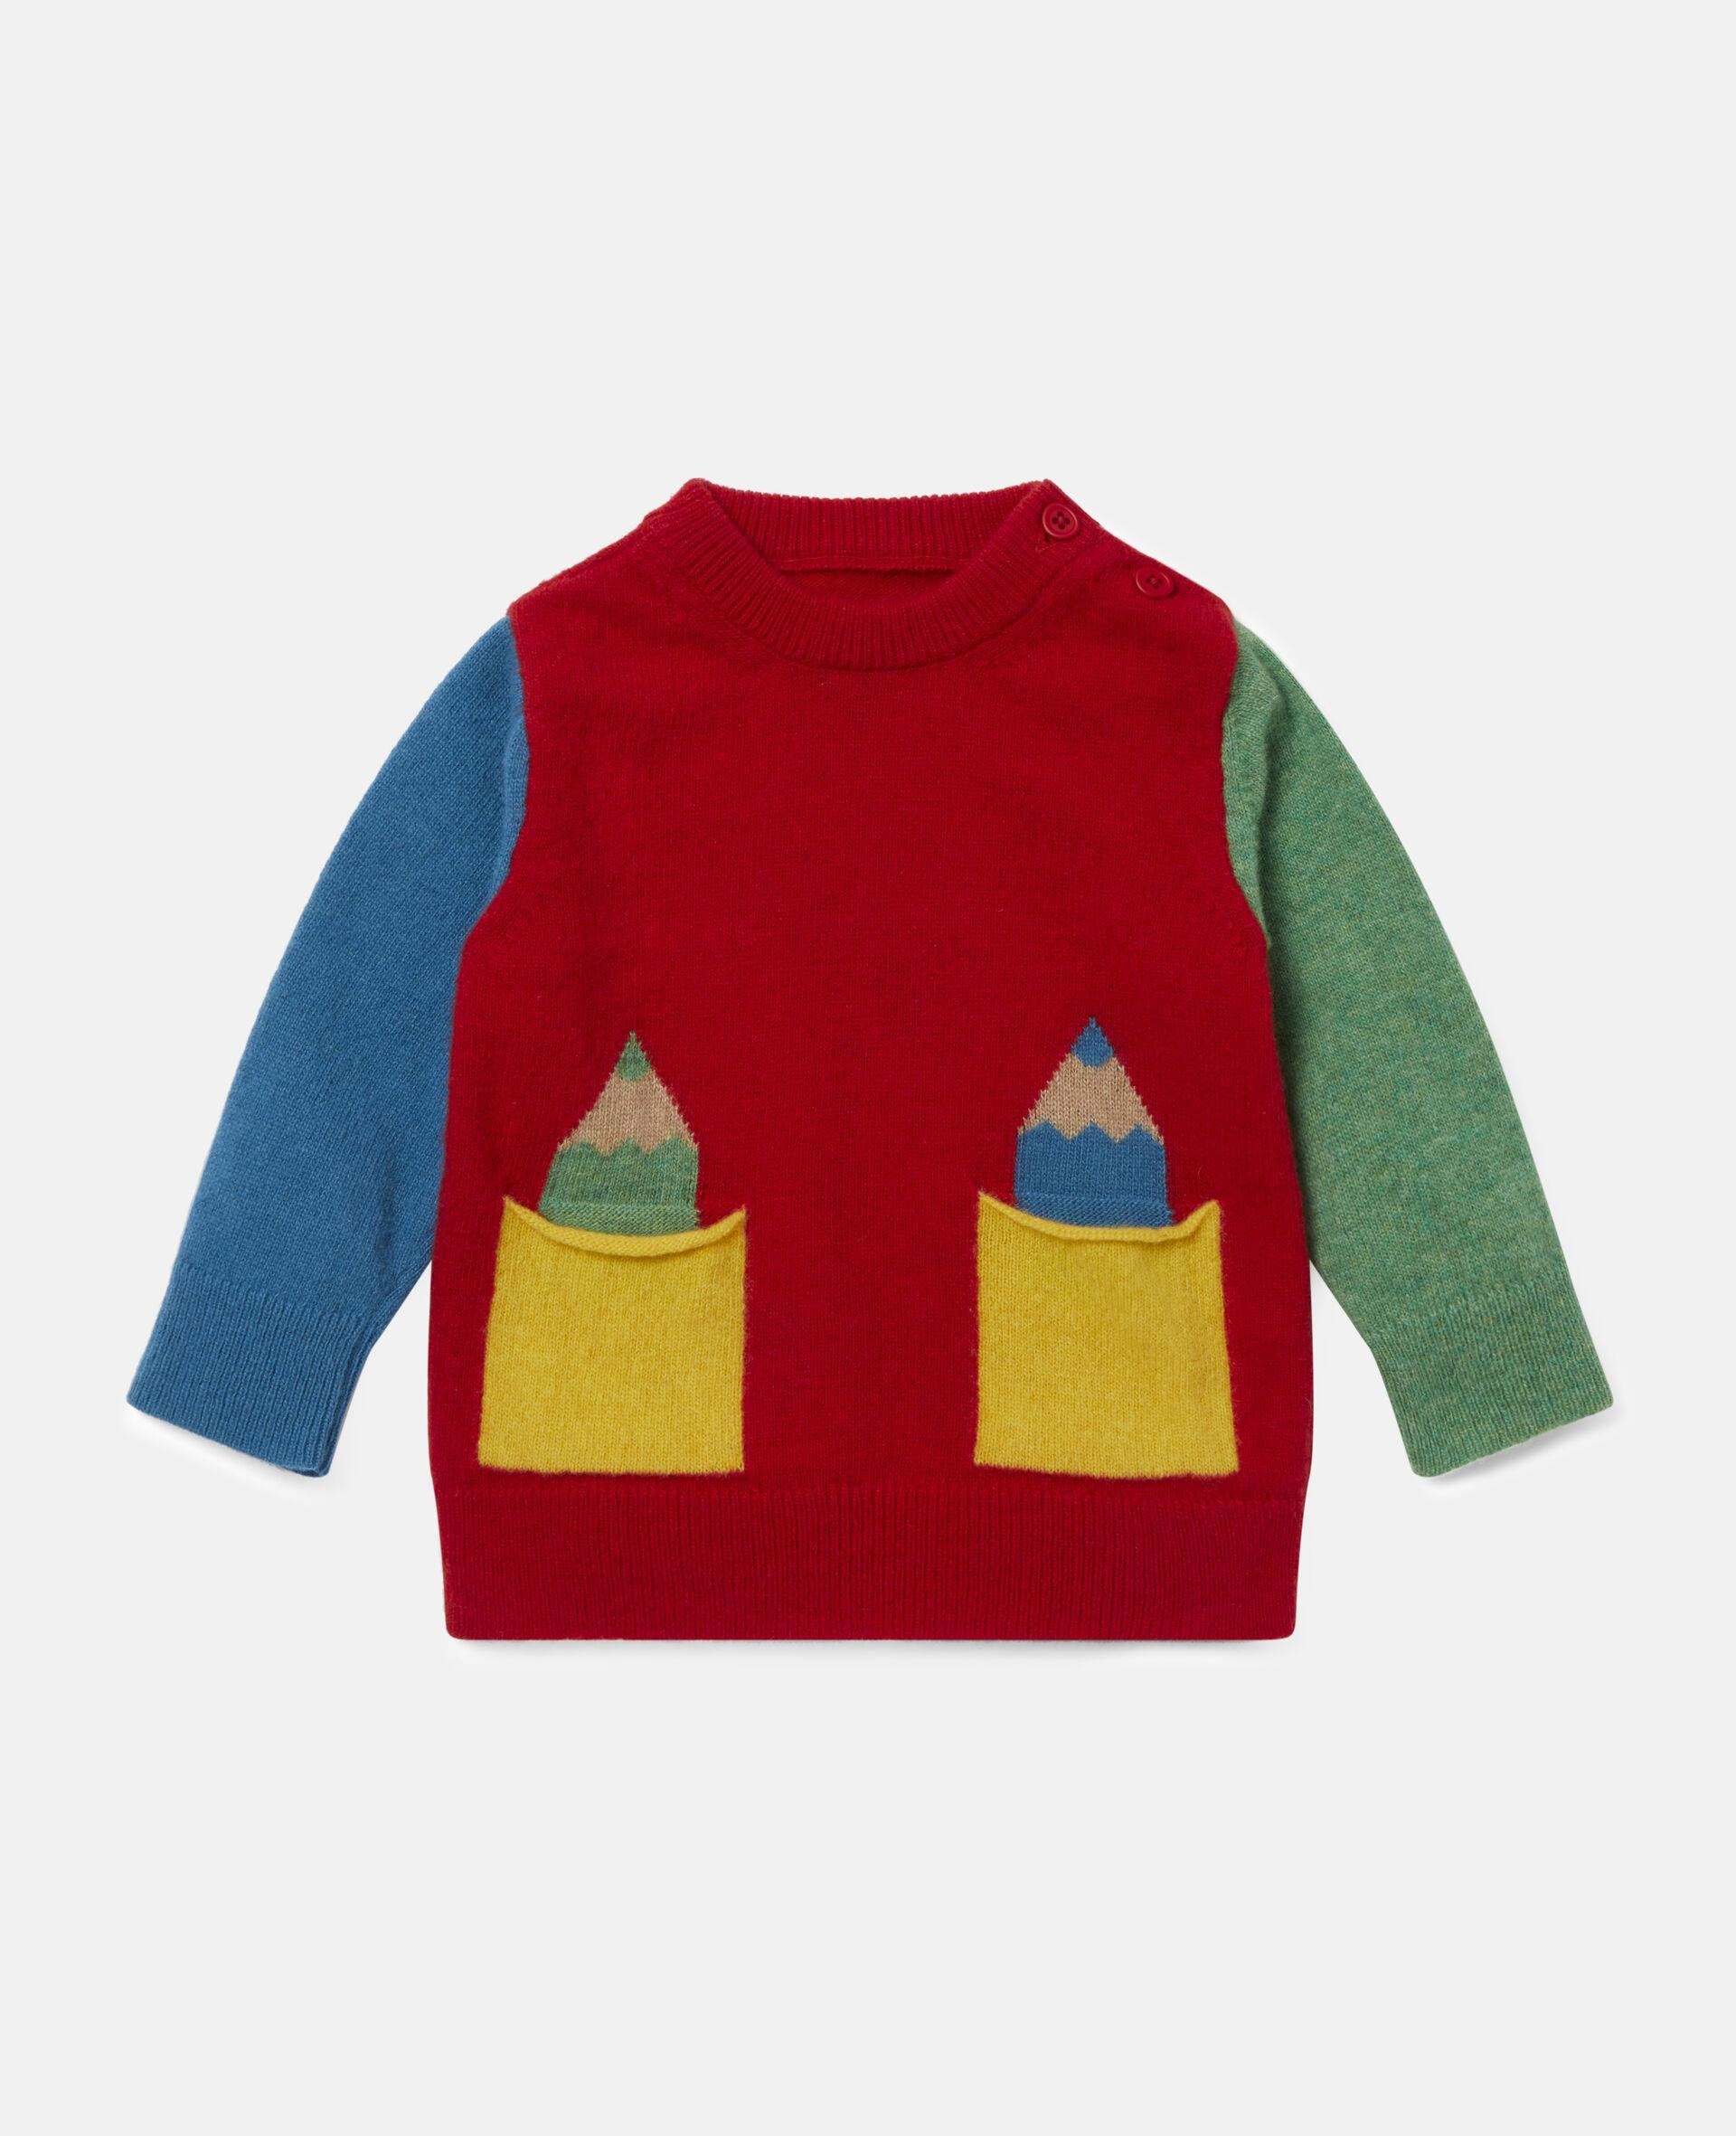 Strickpullover in Blockfarben-Design mit Intarsienmuster-Bunt-large image number 0